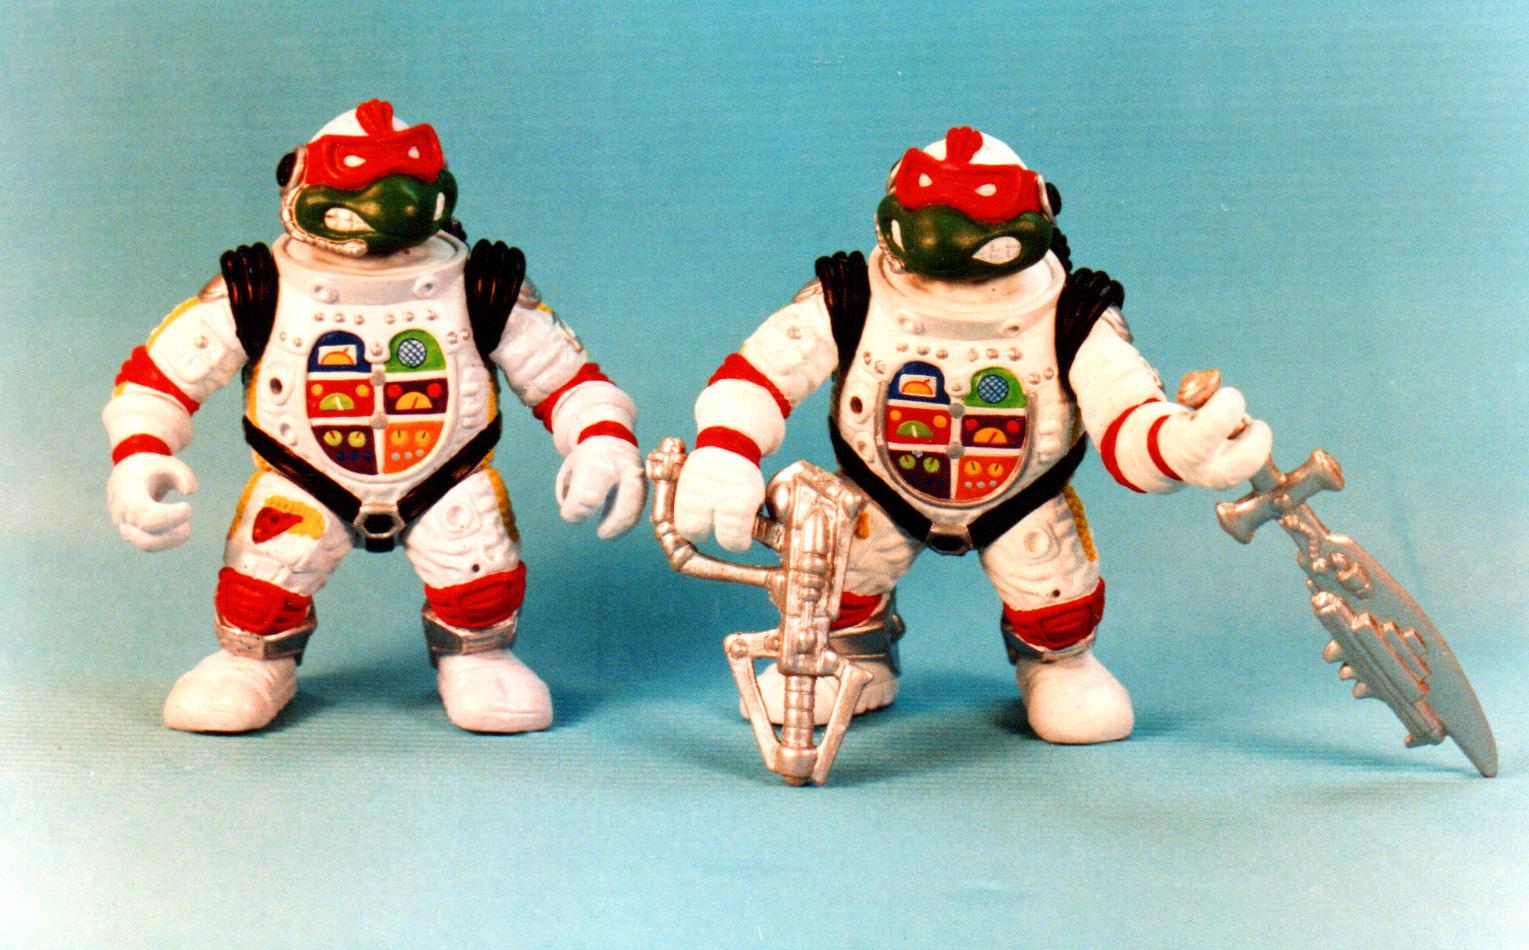 Astronaut Turtles - Turtles in Space